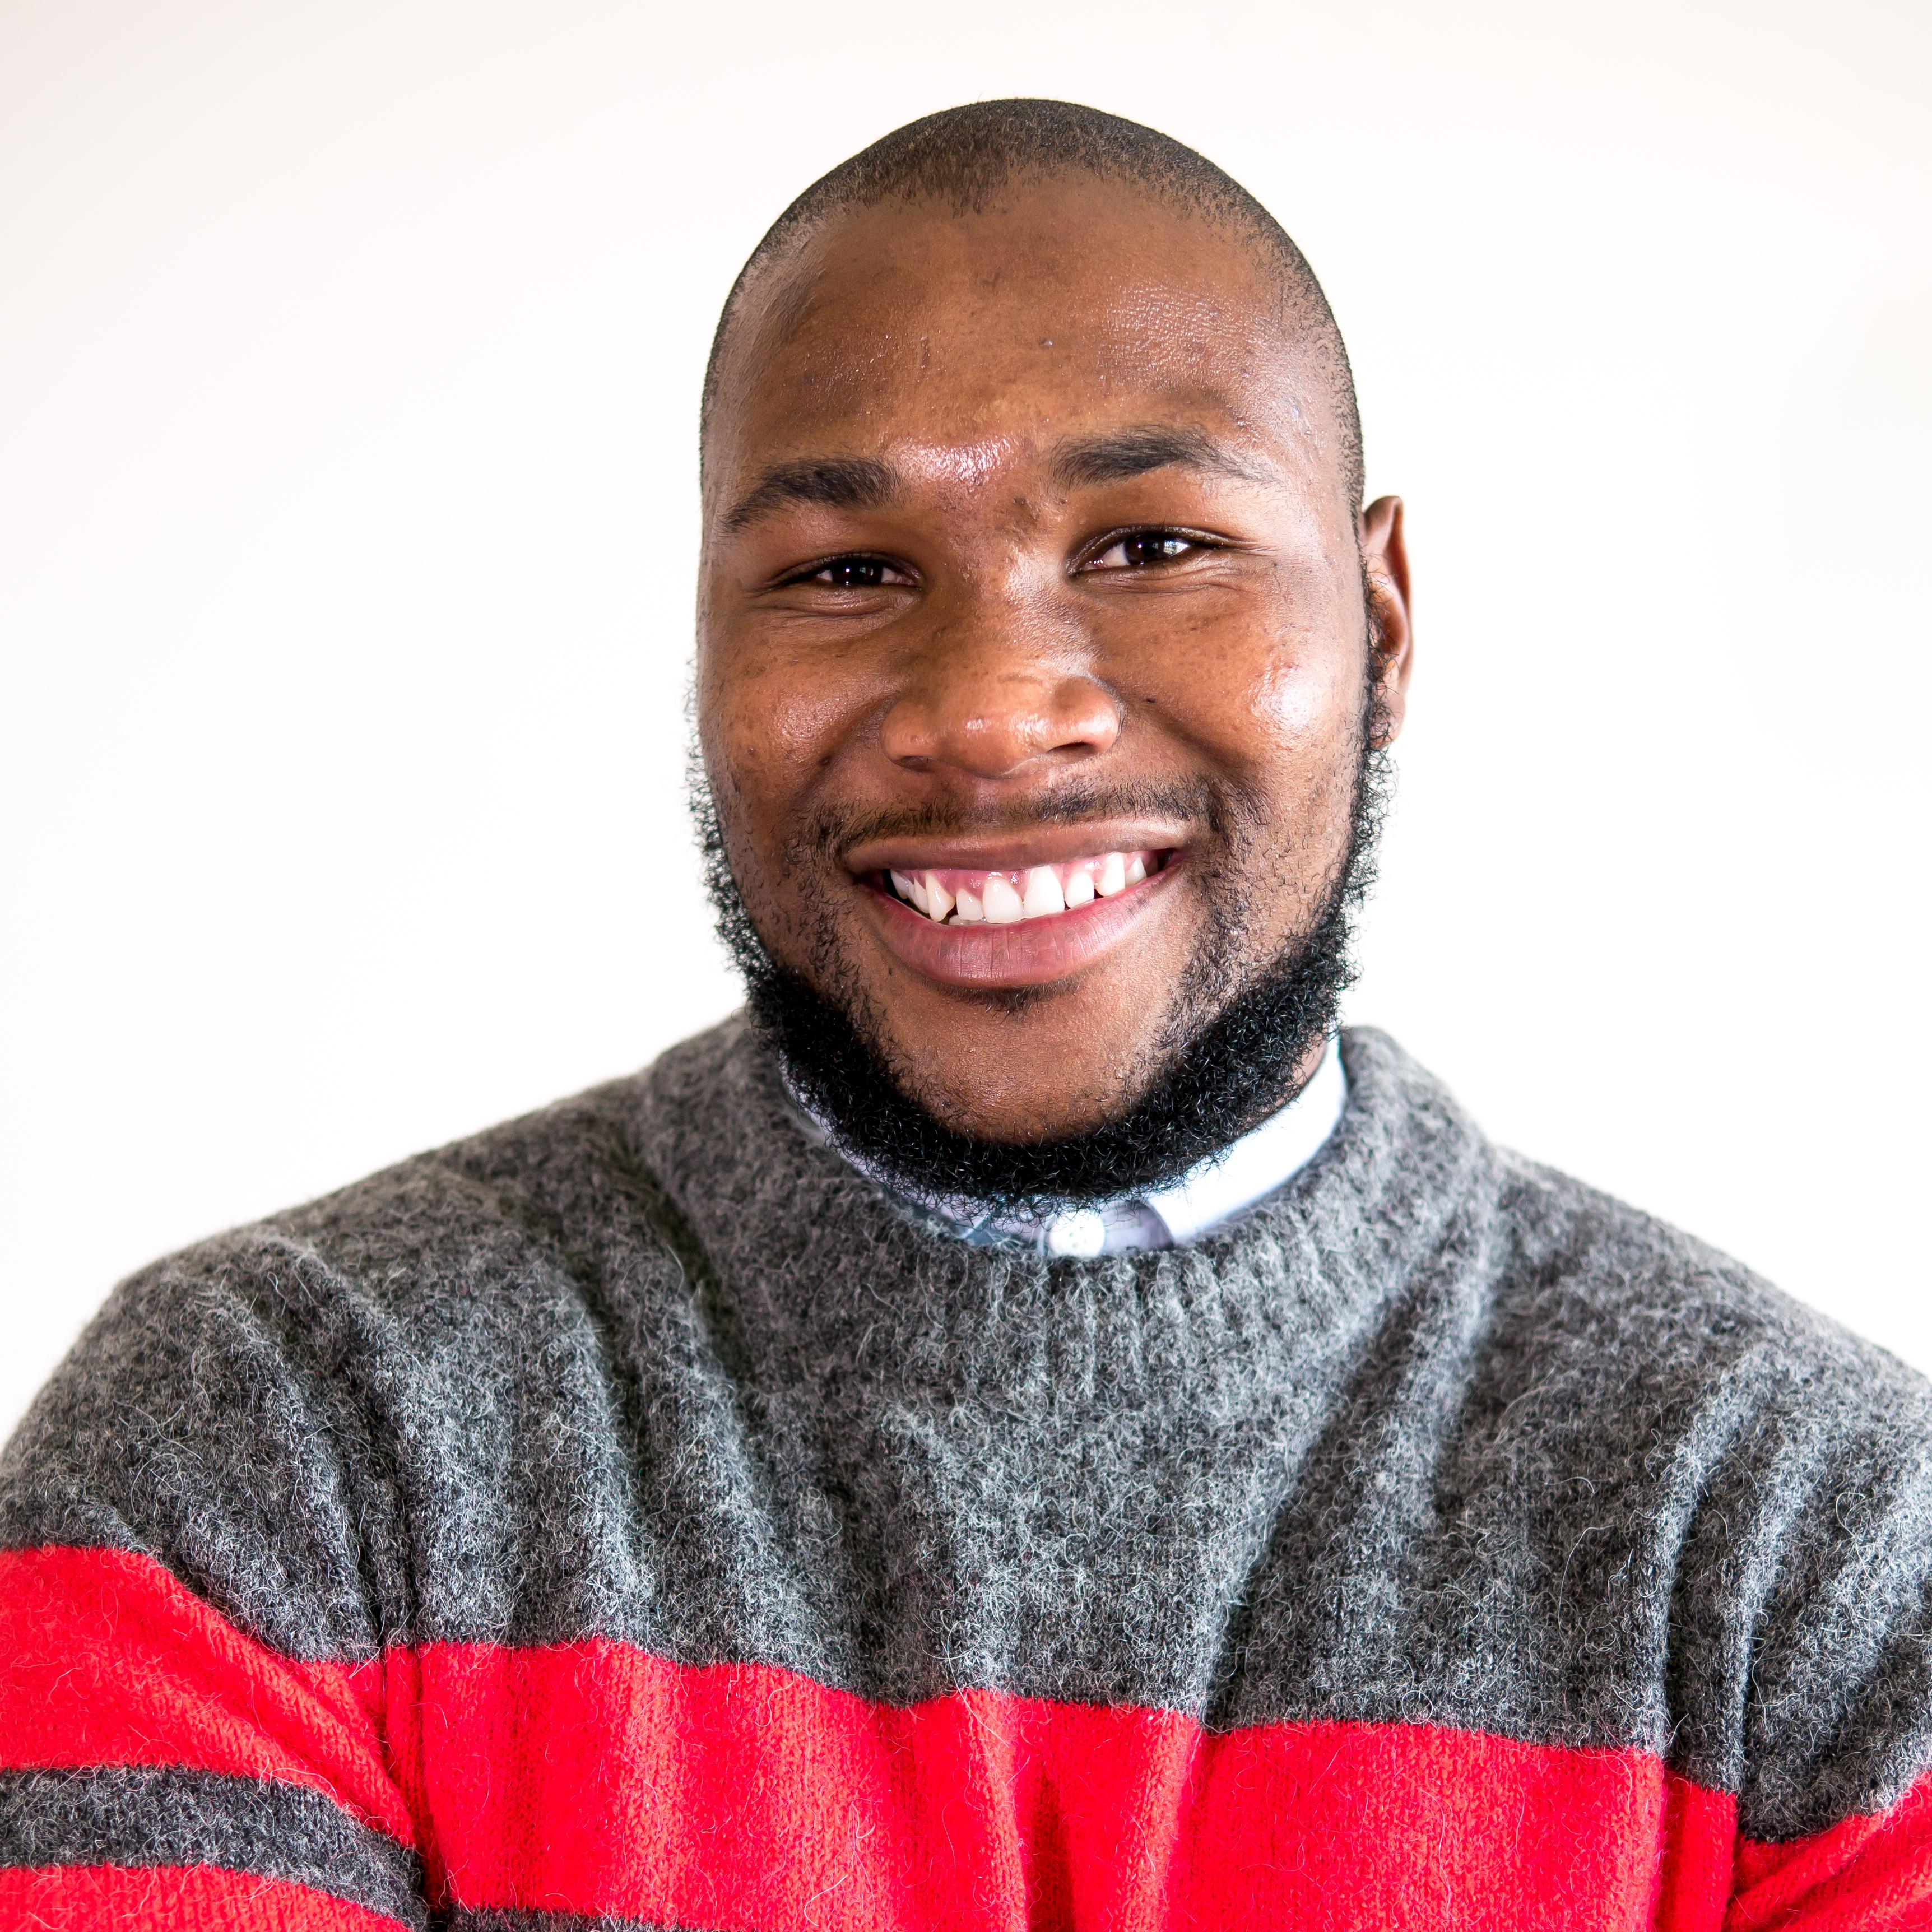 Thabiso Simelane